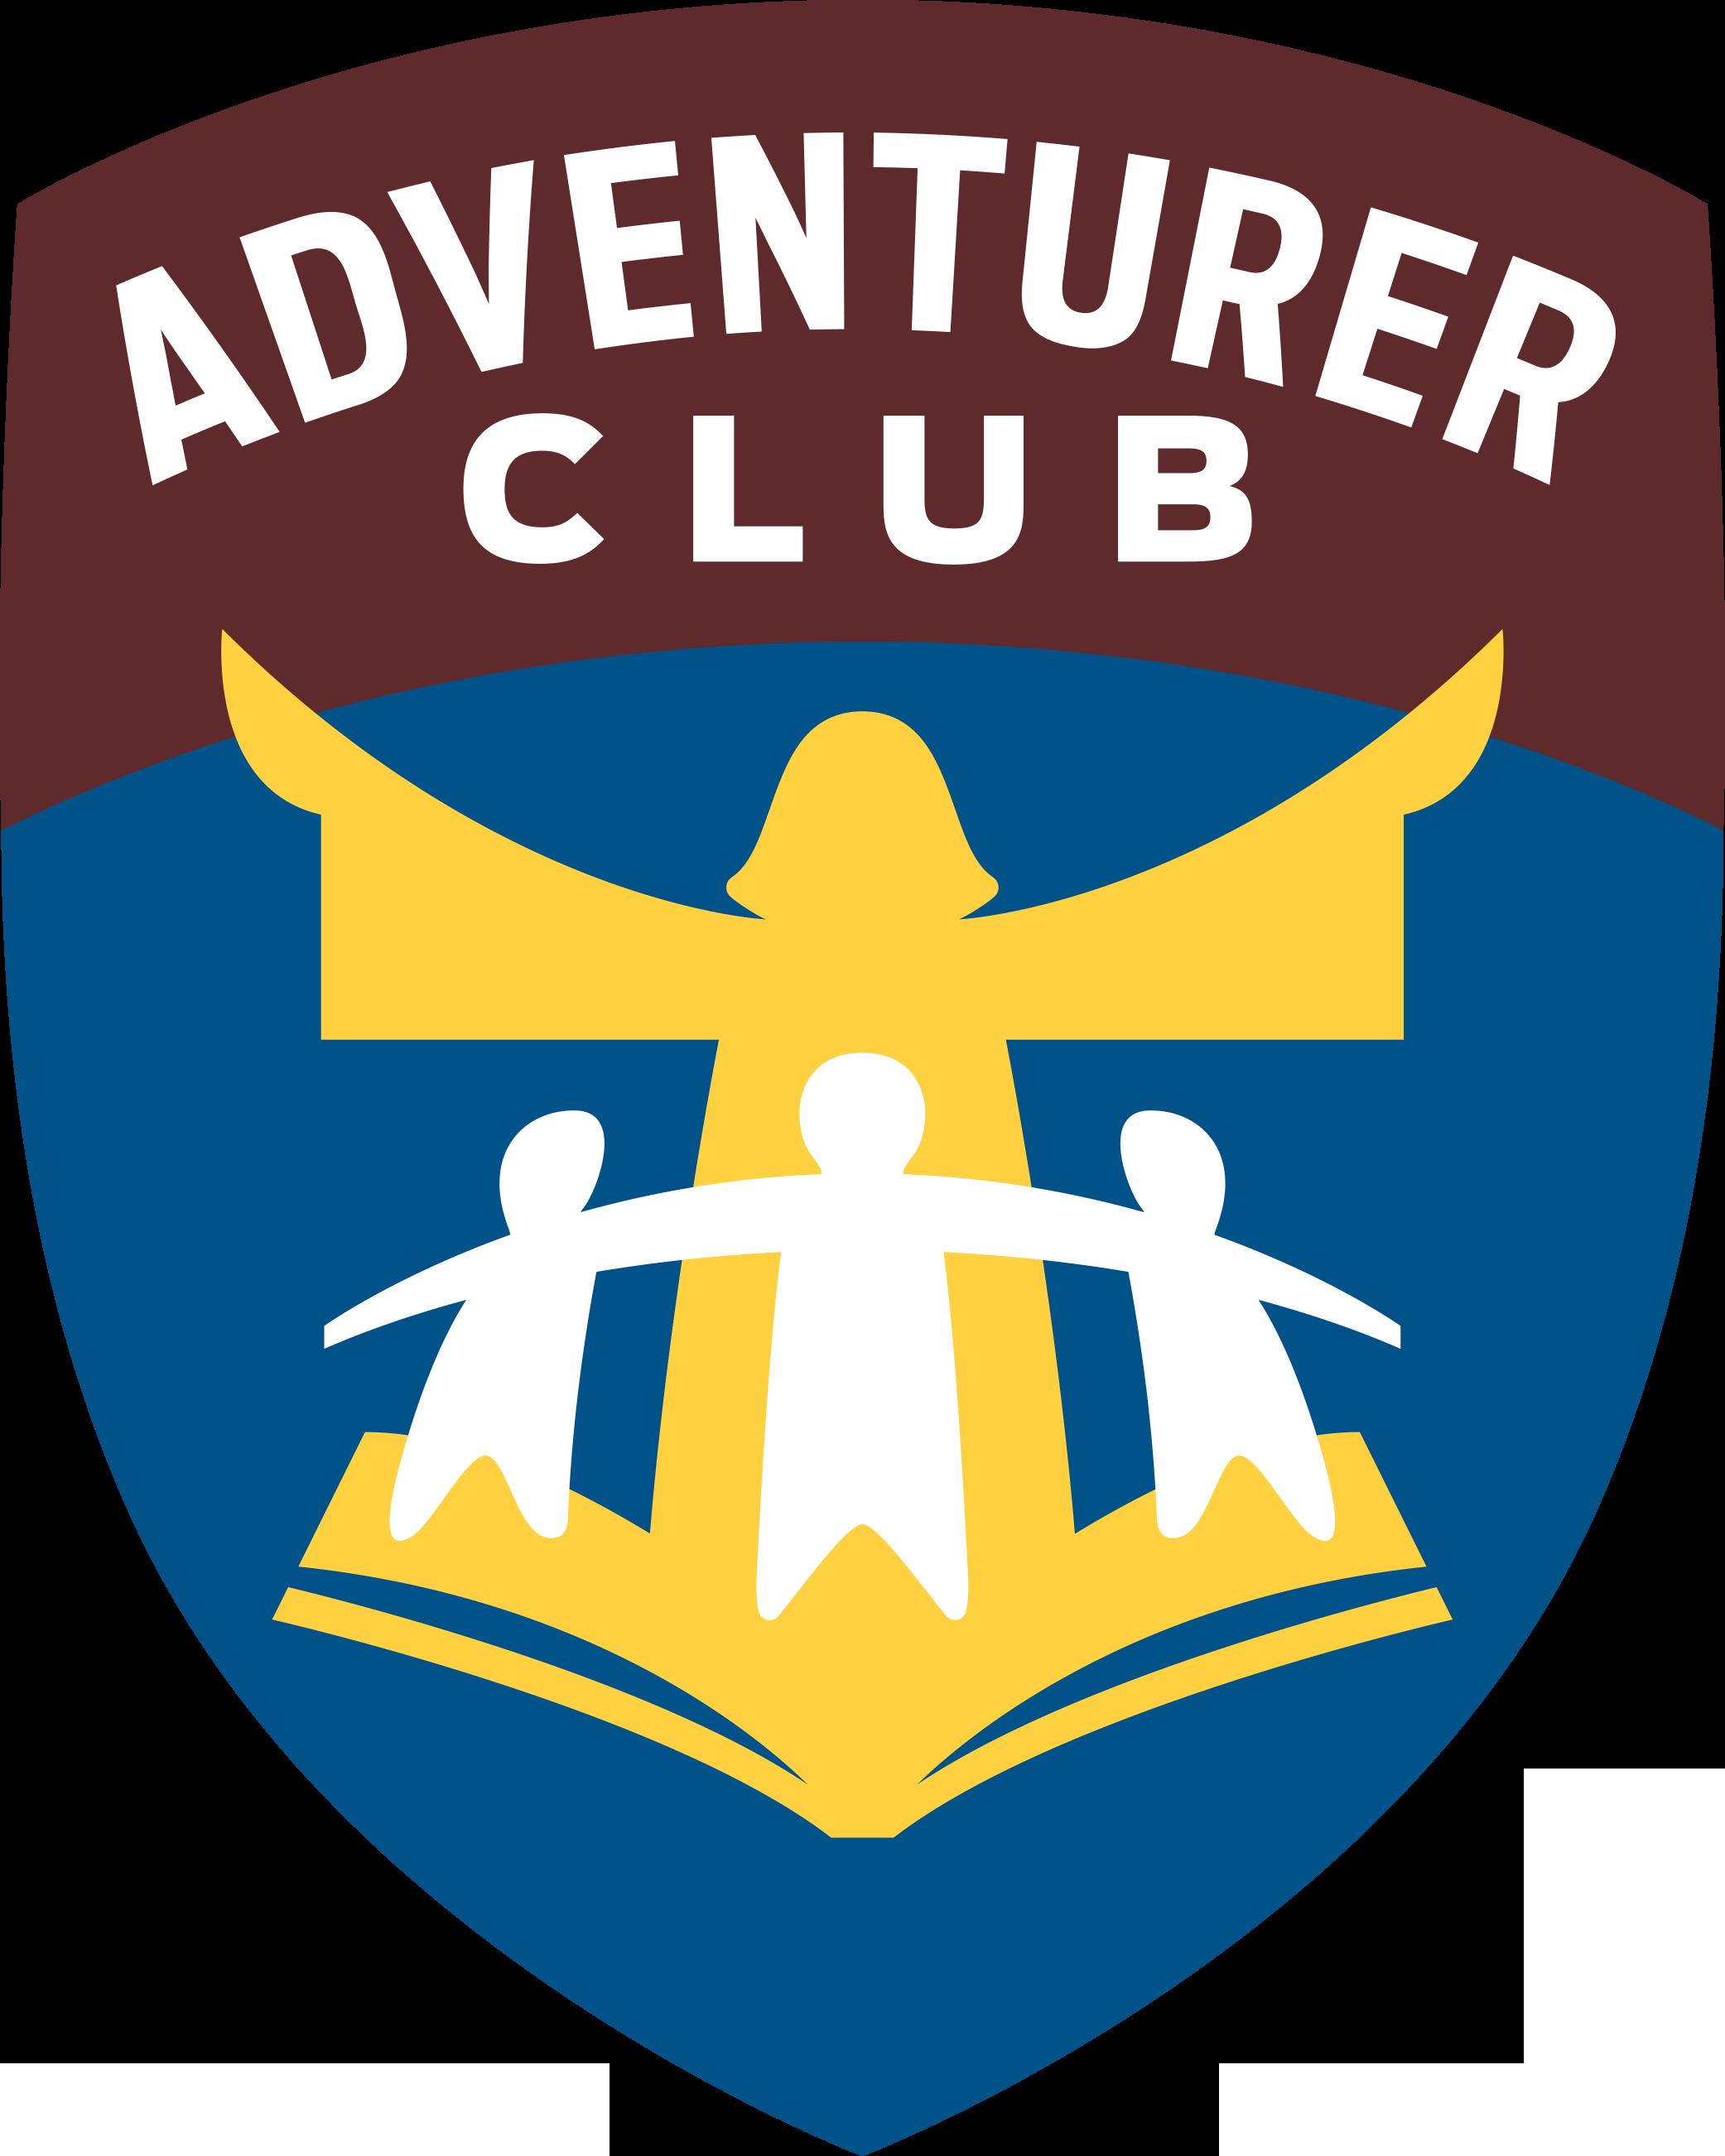 NAD adventurer logo